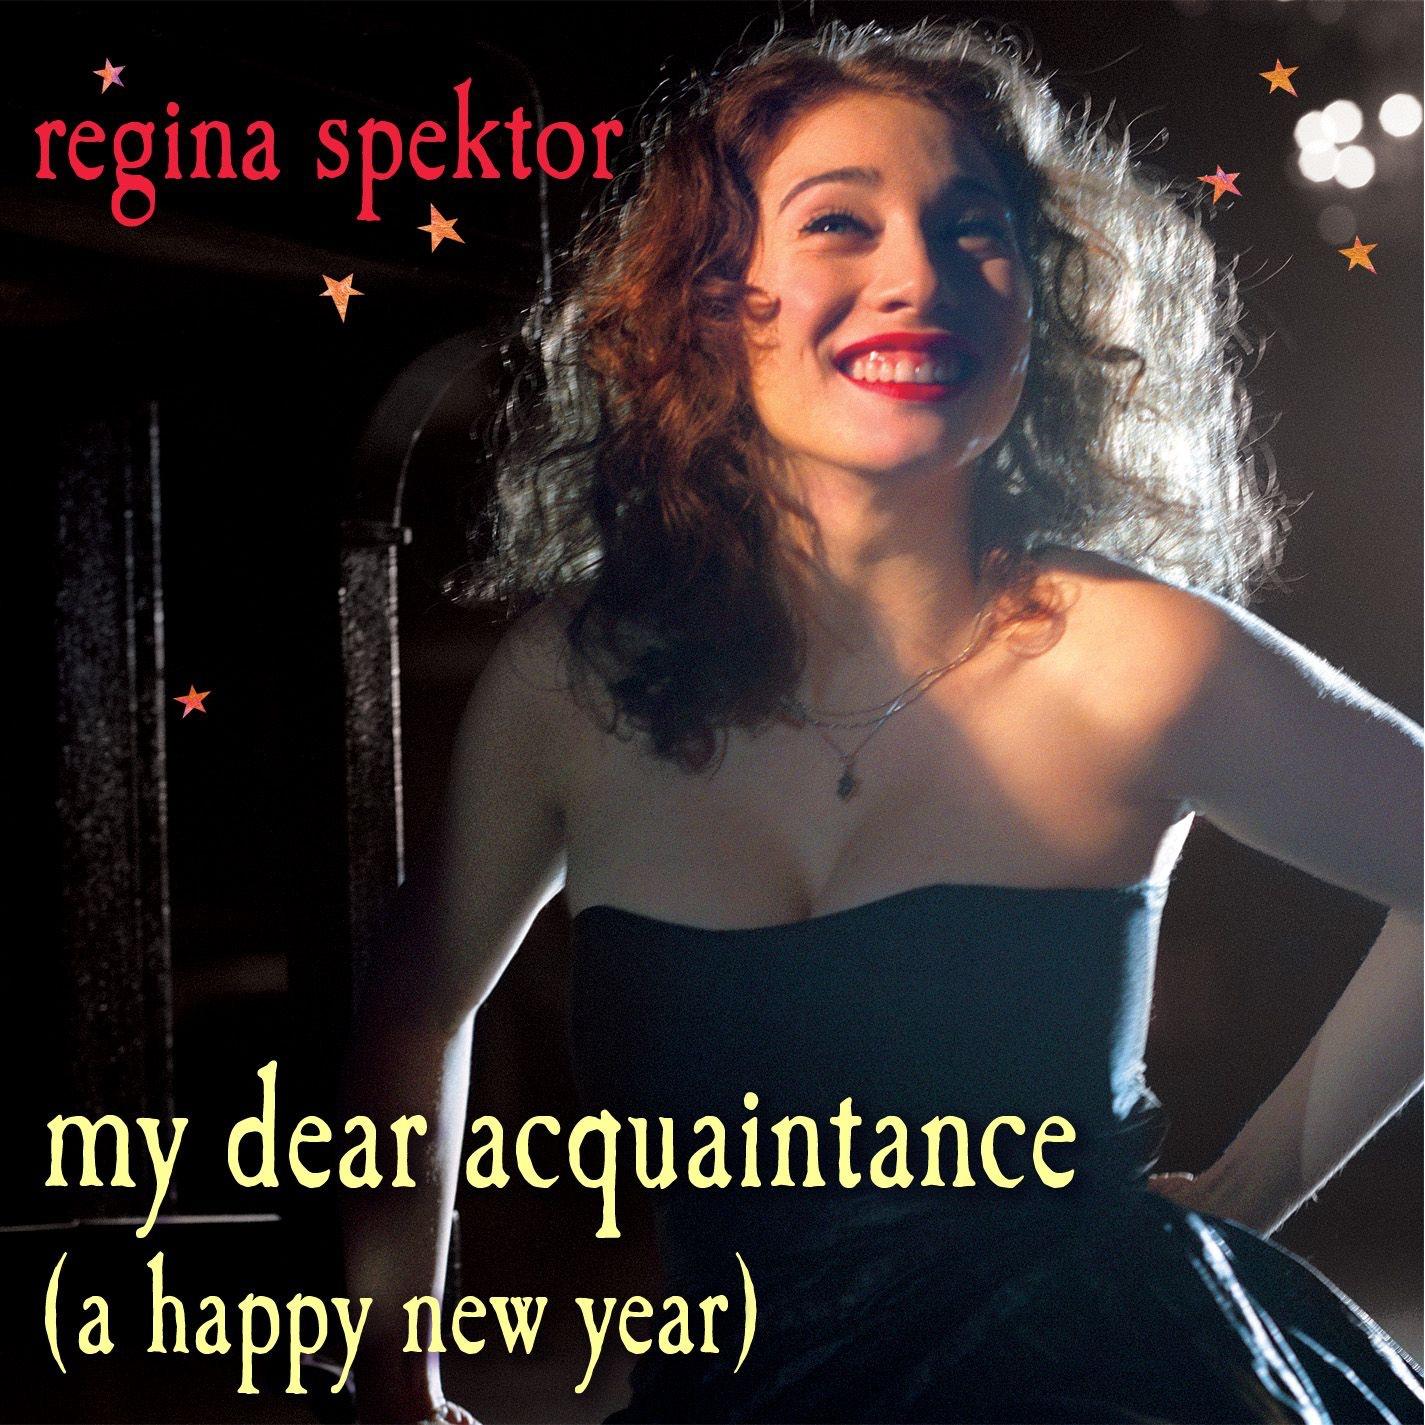 My Dear Acquaintance (A Happy New Year) - Single